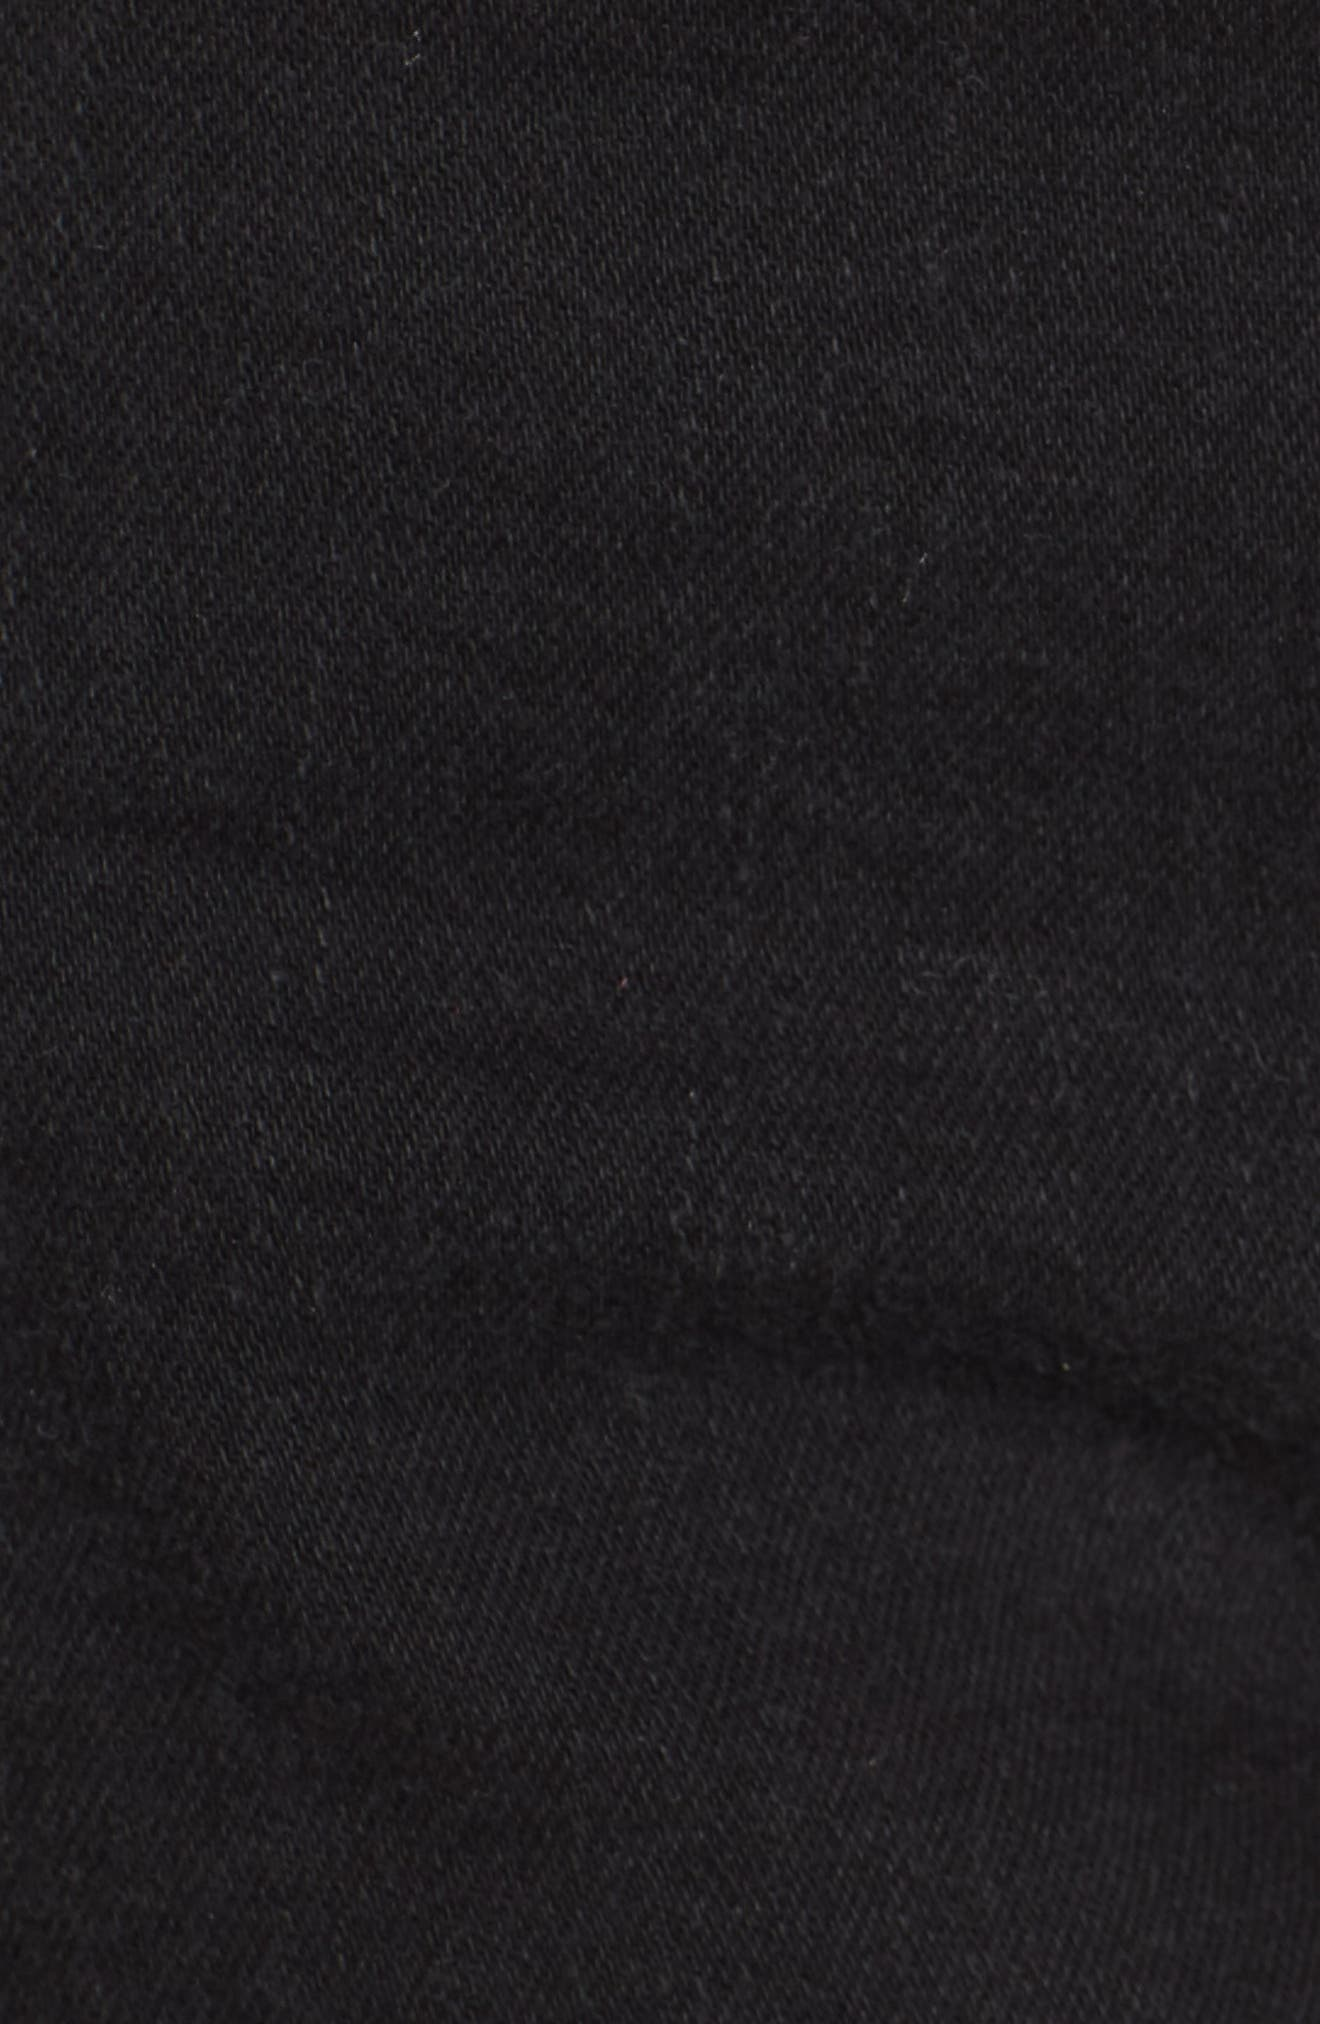 'Margot' High Rise Cutoff Denim Shorts,                             Alternate thumbnail 5, color,                             001